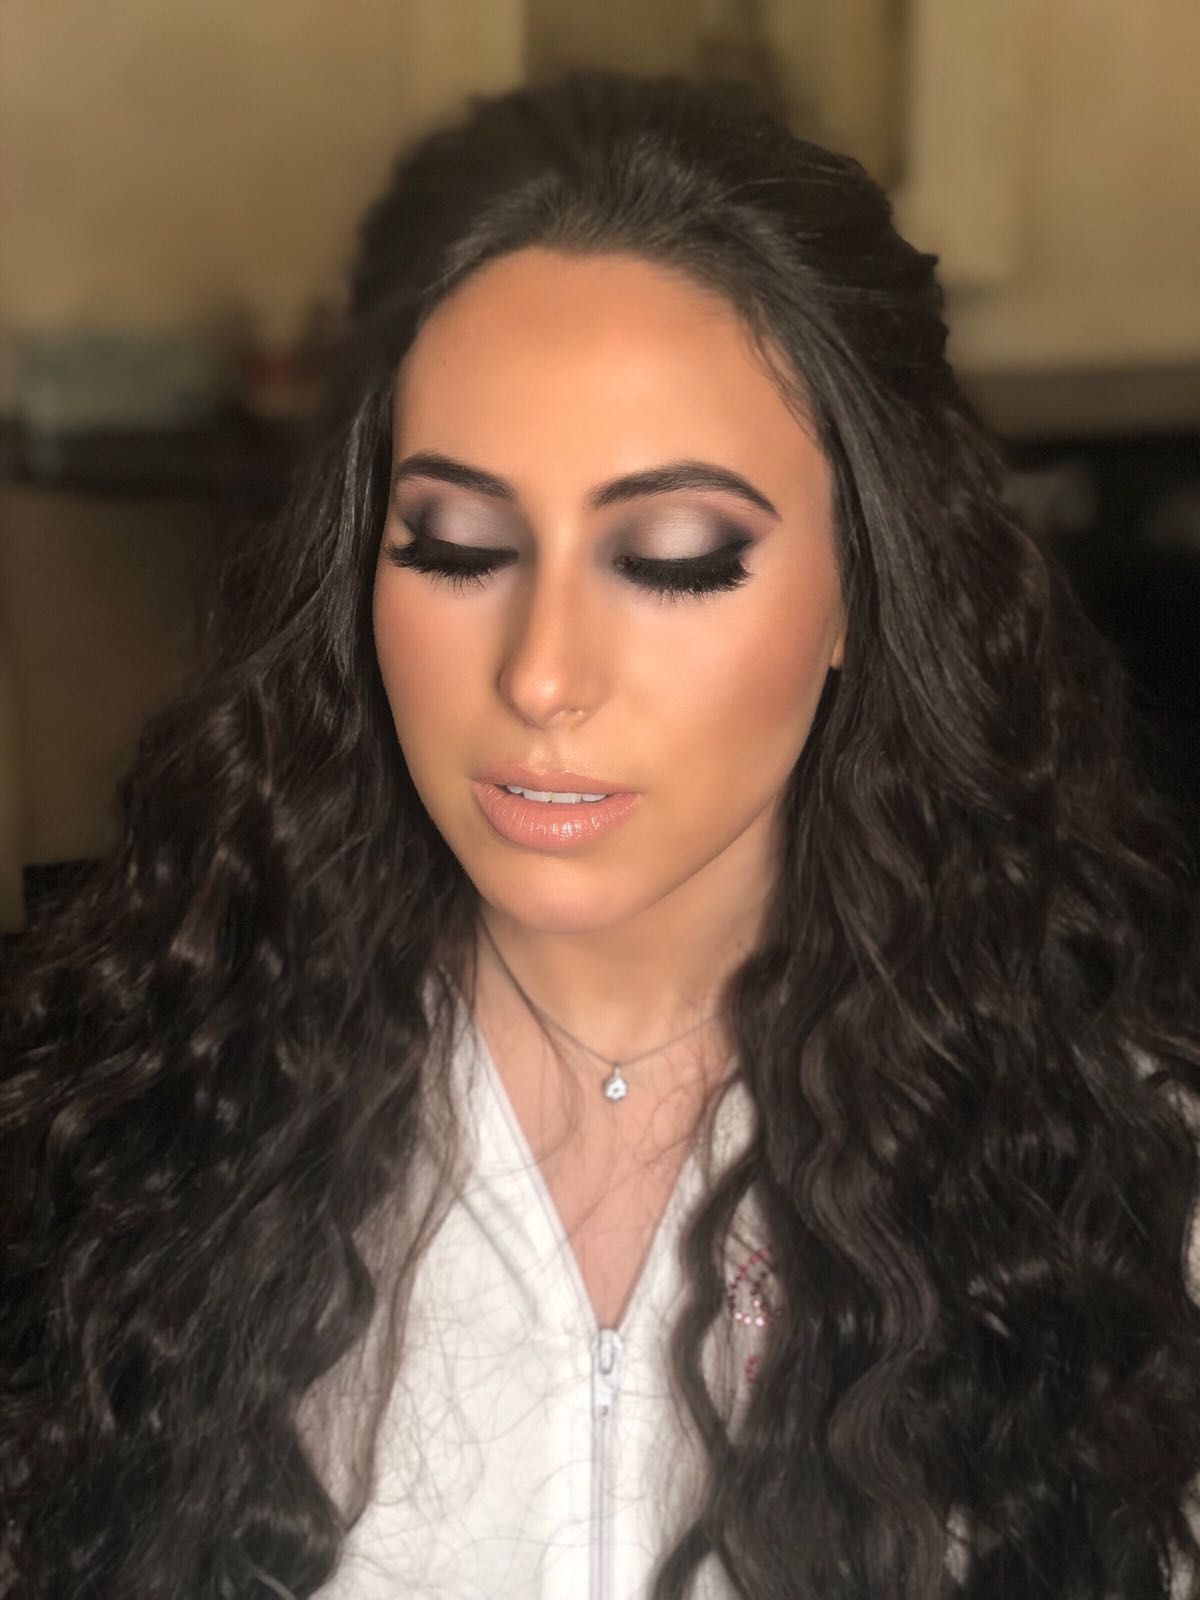 Wedding makeup ideas for winter season Makeup party